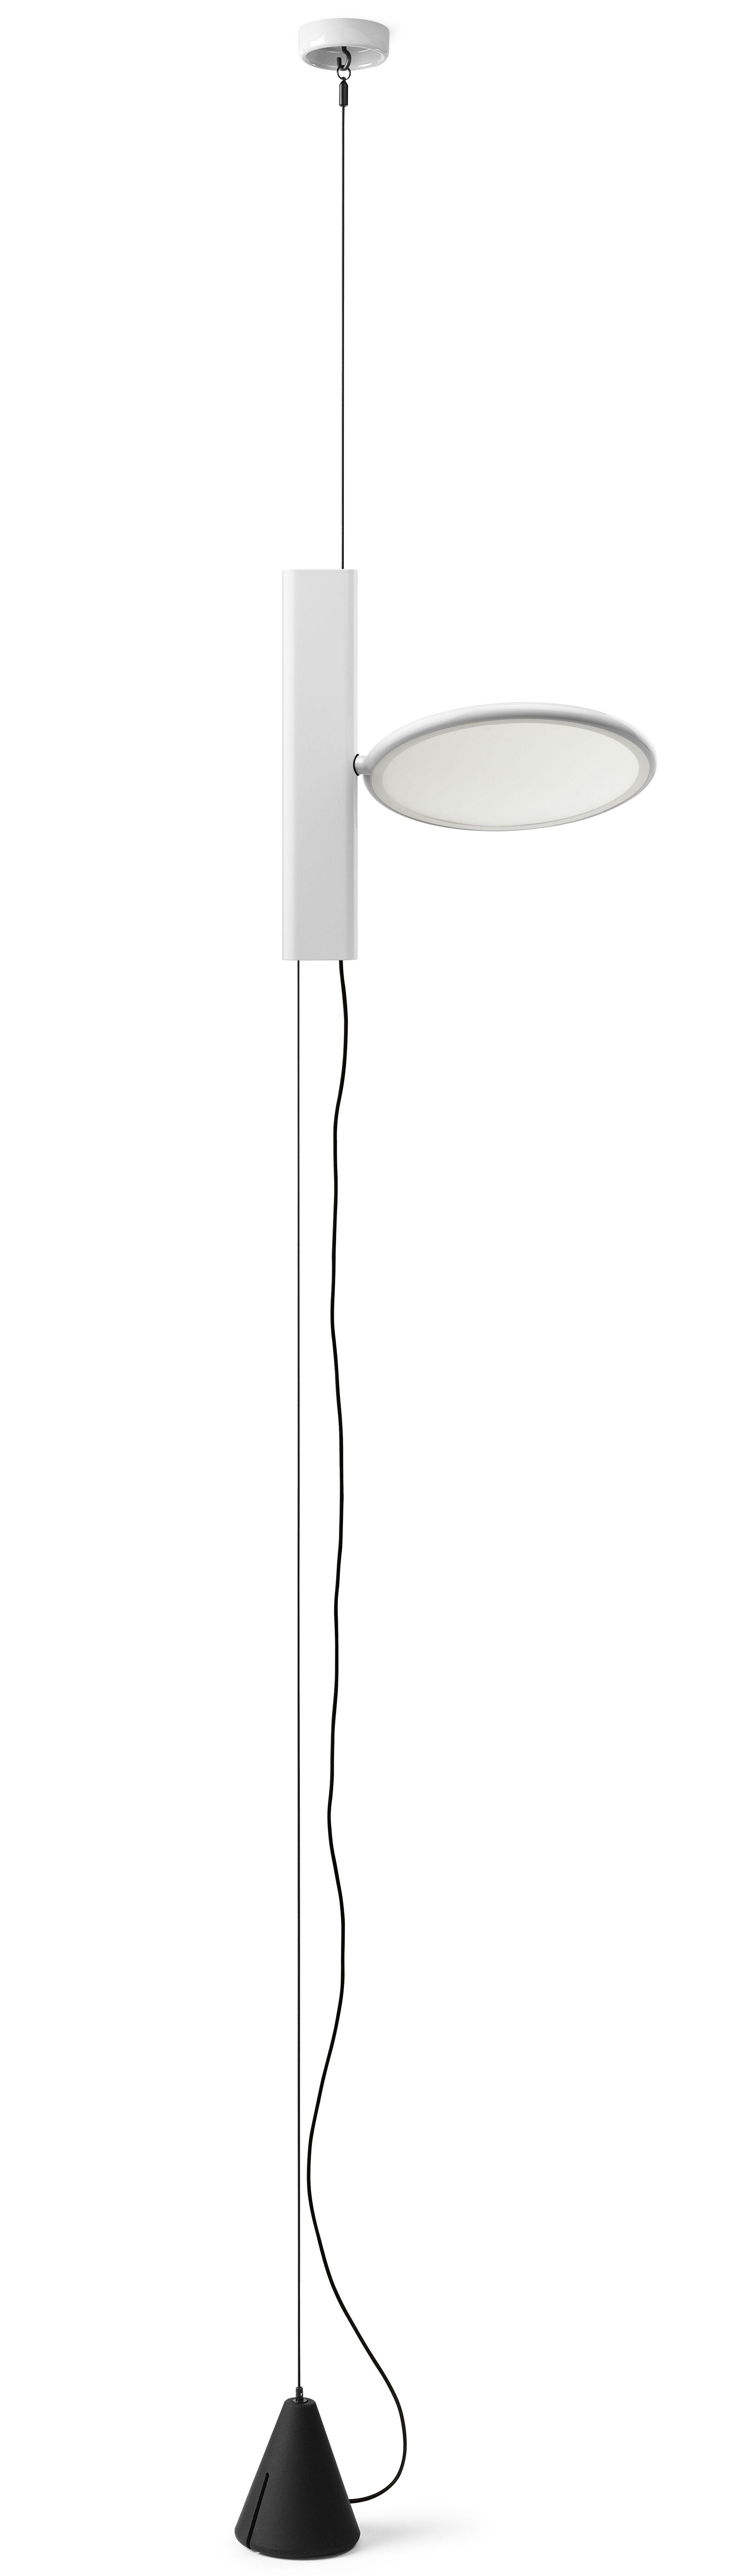 lampe ok suspendre au plafond led blanc flos. Black Bedroom Furniture Sets. Home Design Ideas